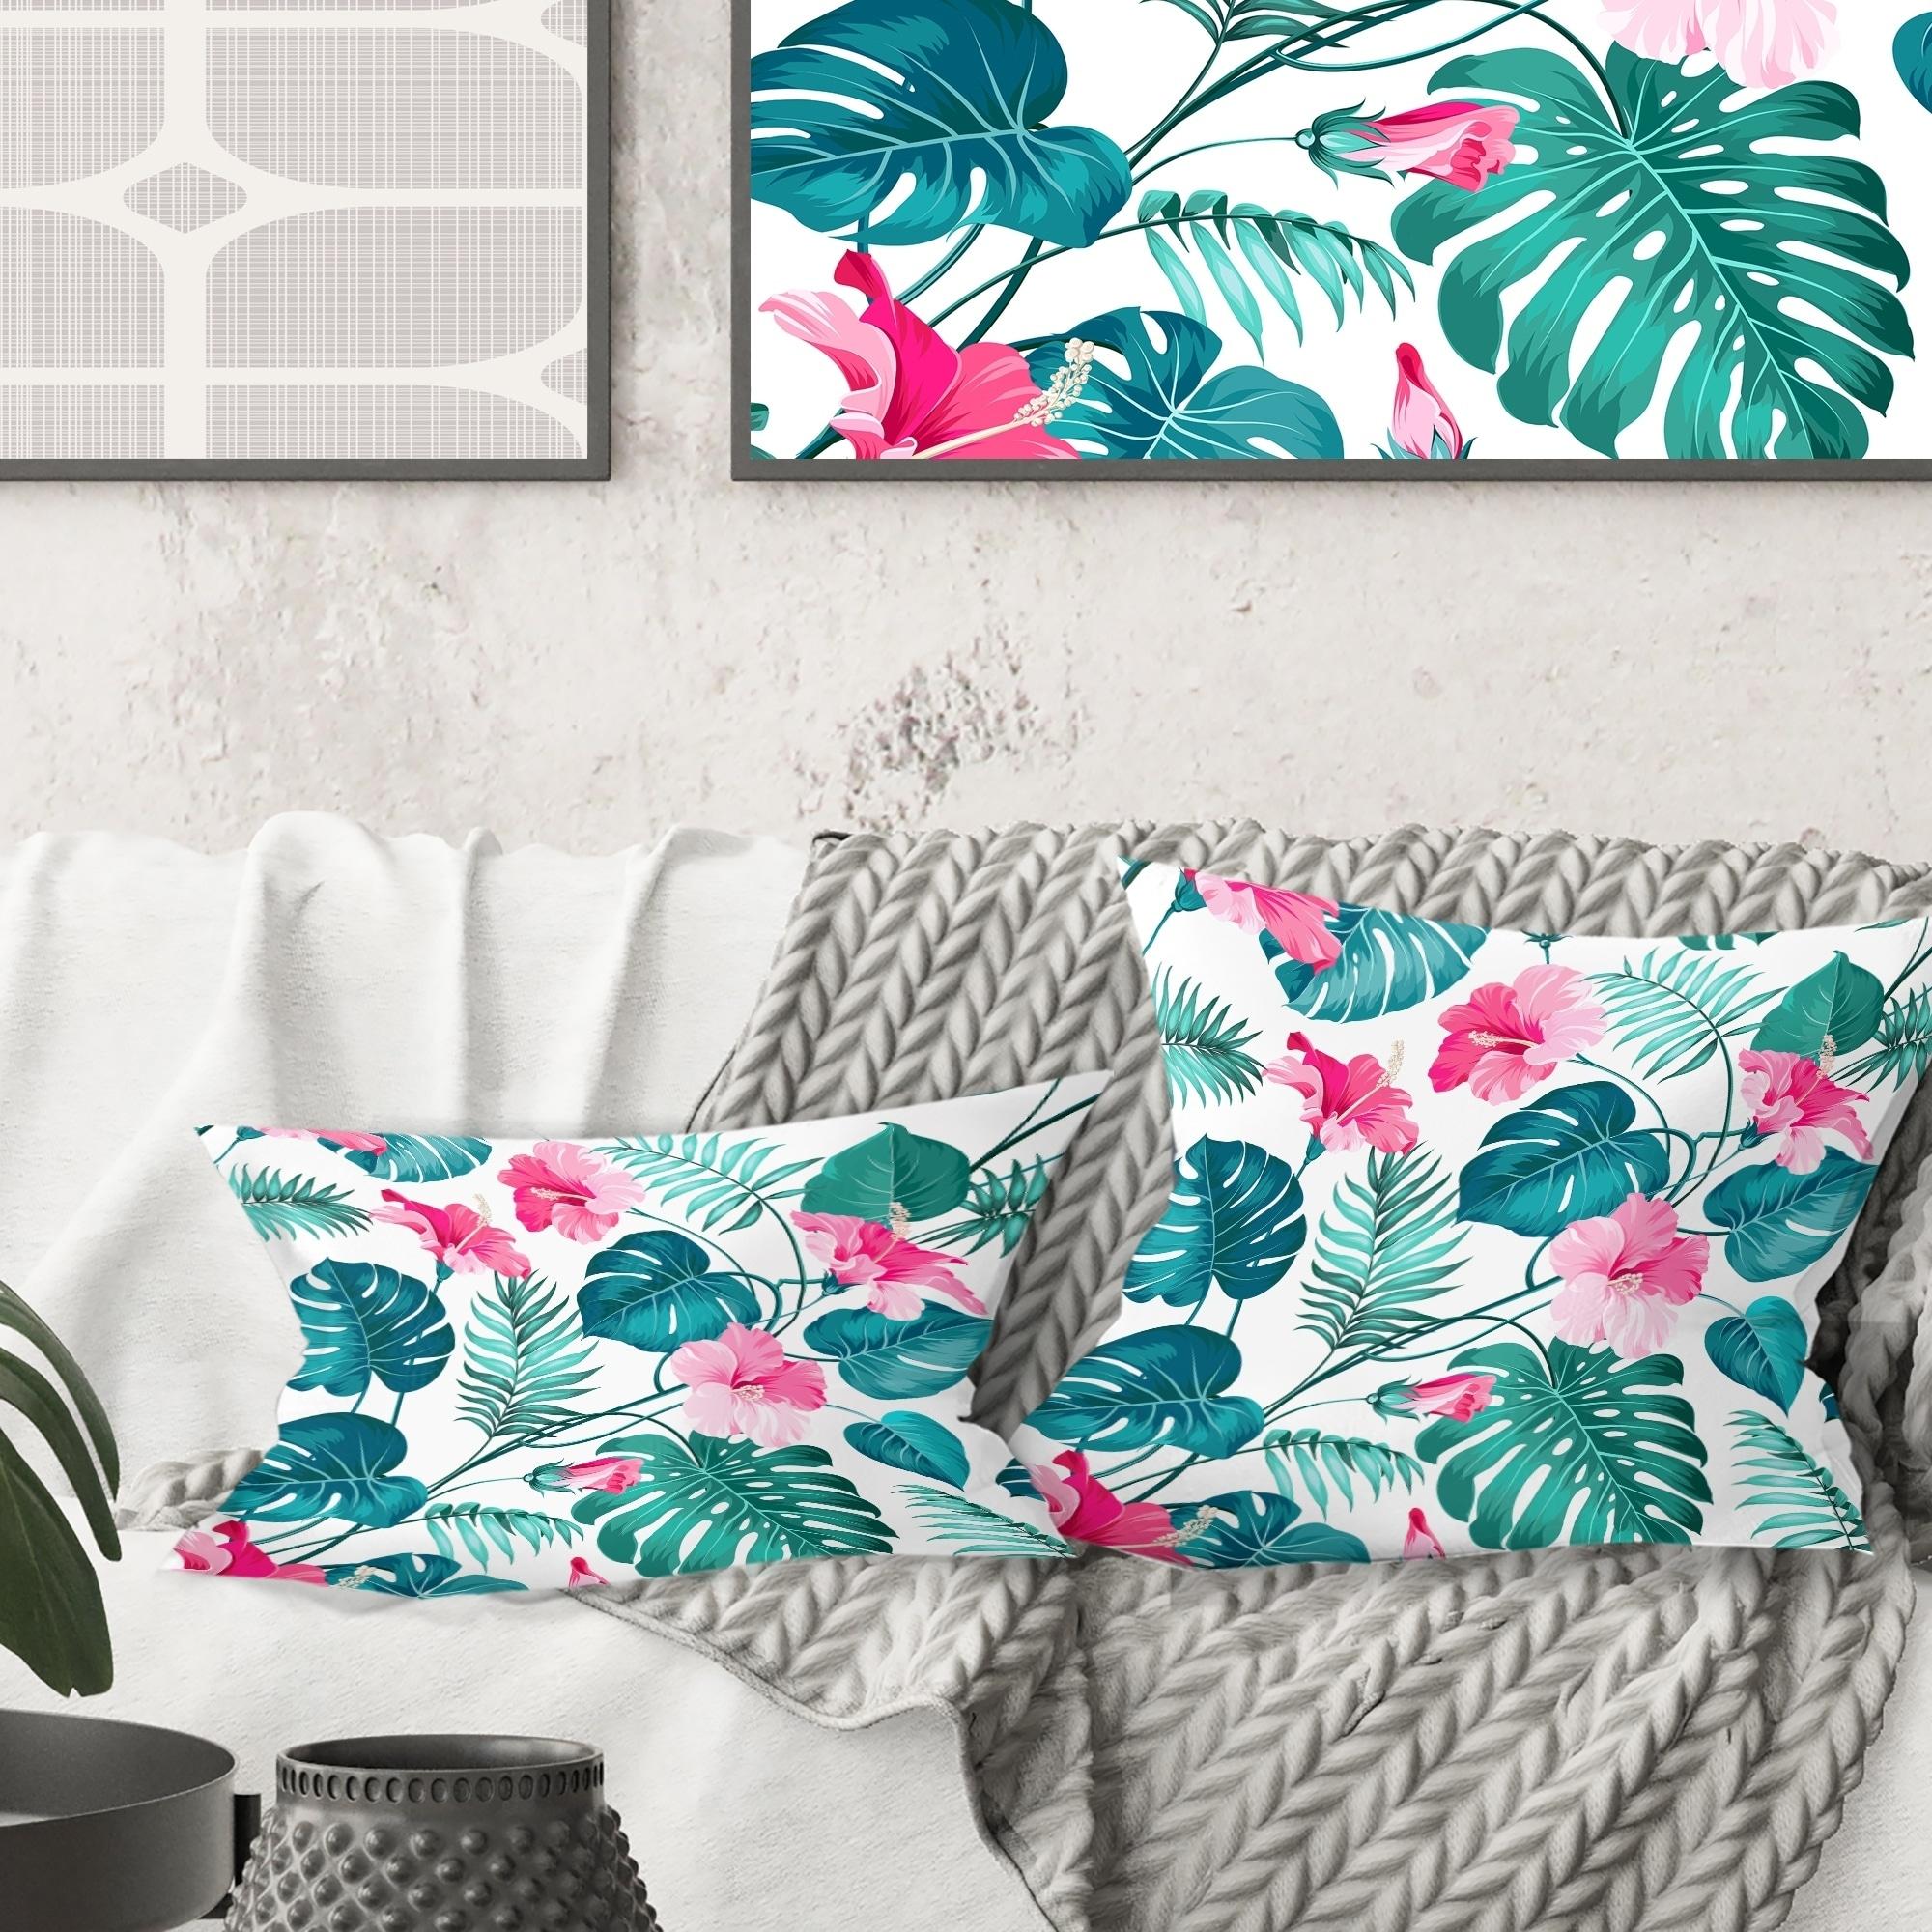 Designart Tropical Botanicals And Flowers Mid Century Modern Throw Pillow Overstock 29064304